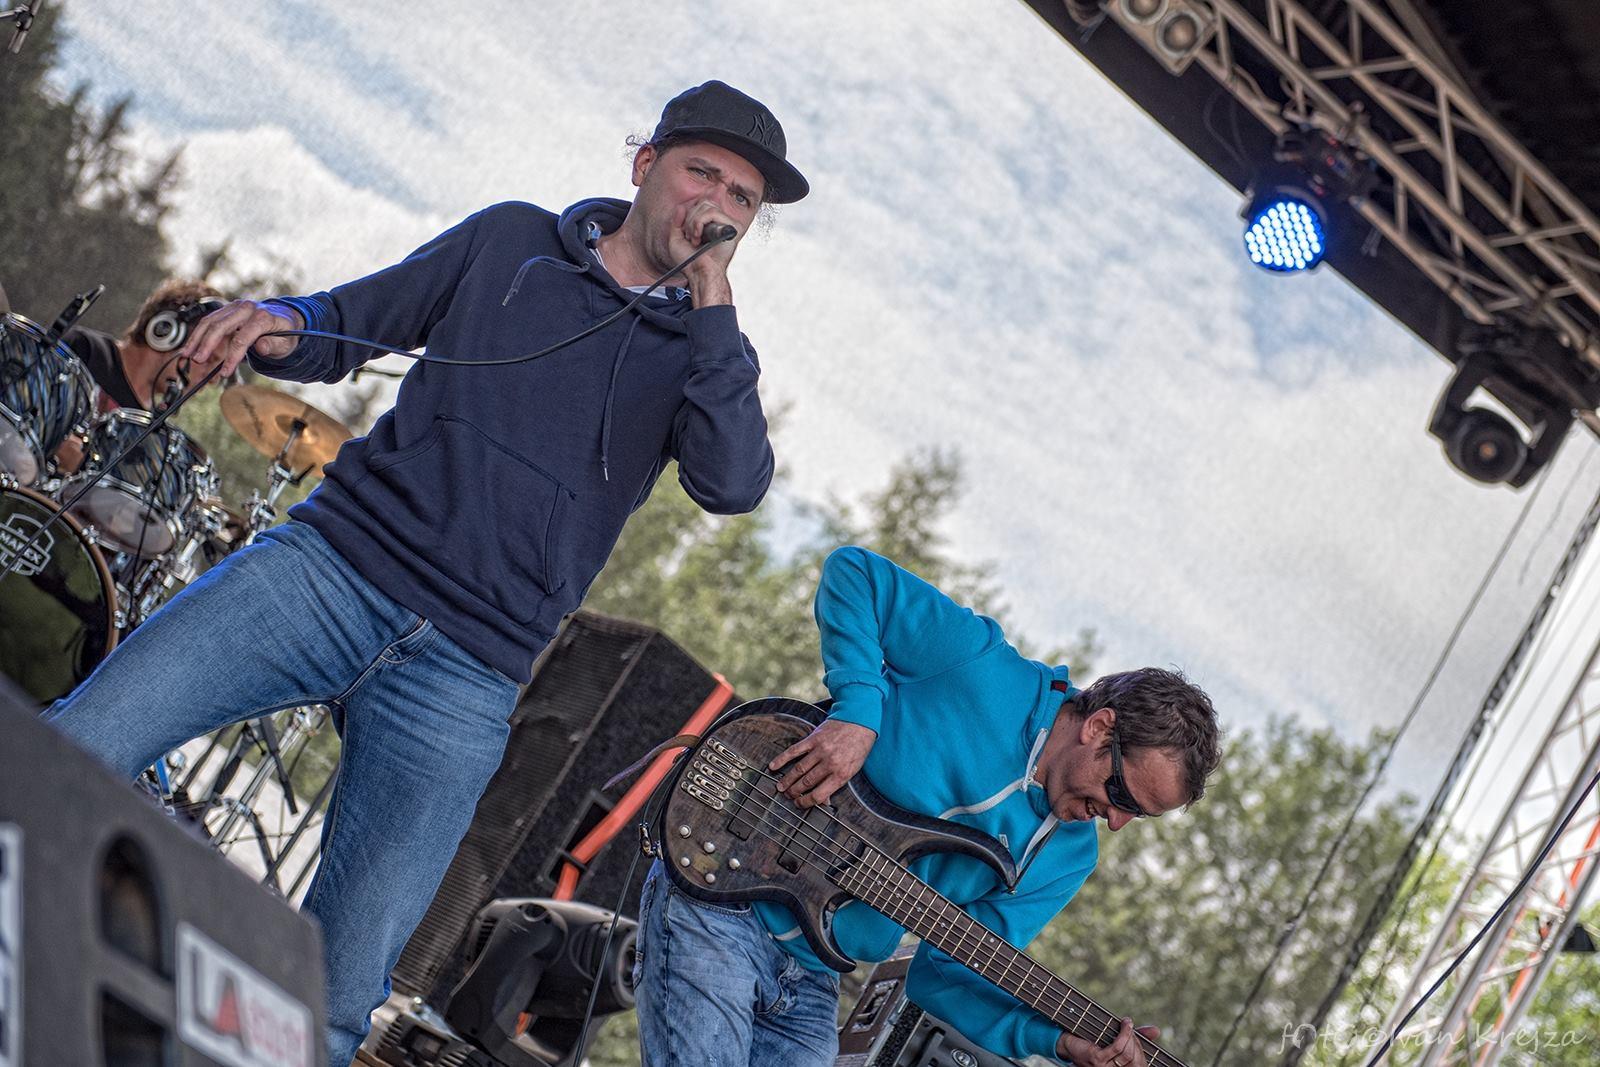 2015-06-20 - Hrebecsky Slunovrat 2015 - 12 (Gang Ala Basta) - Lukáš Máchal, Jan Somy Somolík, Michal Pavlíček jr.